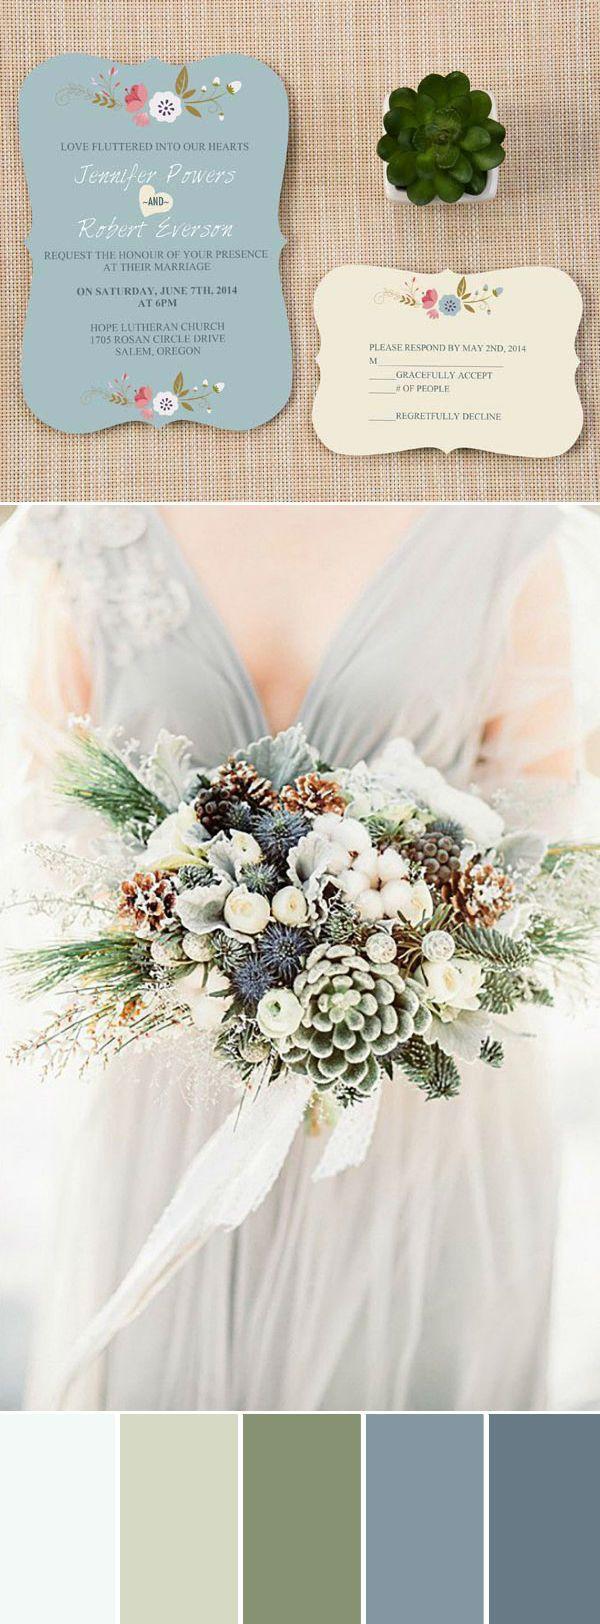 The 469 best Wedding Color Ideas images on Pinterest | Wedding ideas ...